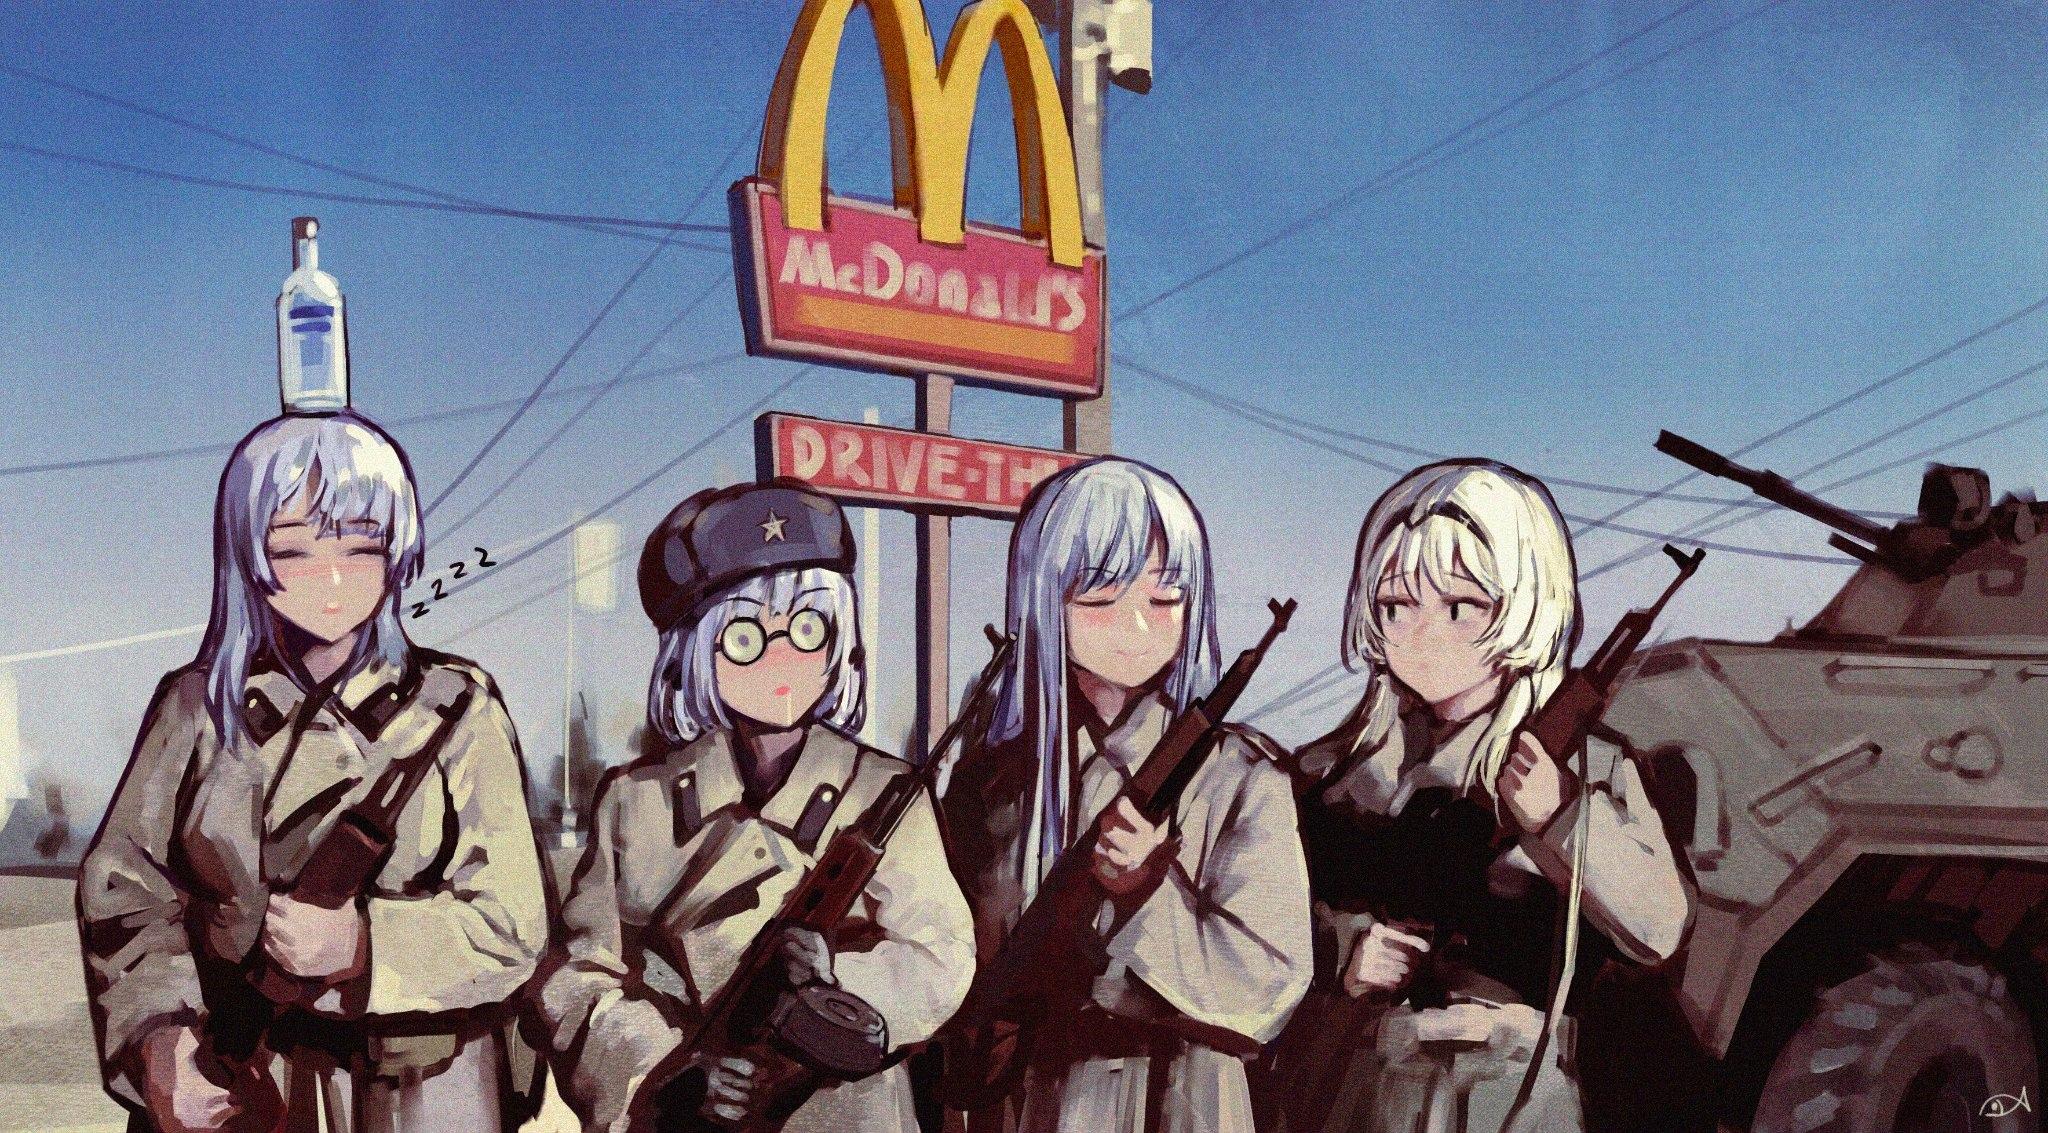 Anime 2048x1133 anime girls WestKing Girls Frontline AK-12 (Girls Frontline) AK-15 (Girls Frontline) AN-94 (Girls Frontline) RPK-16 (Girls Frontline) BTR-80 vehicle Military Uniform military vehicle weapon vodka ushanka parody McDonald's